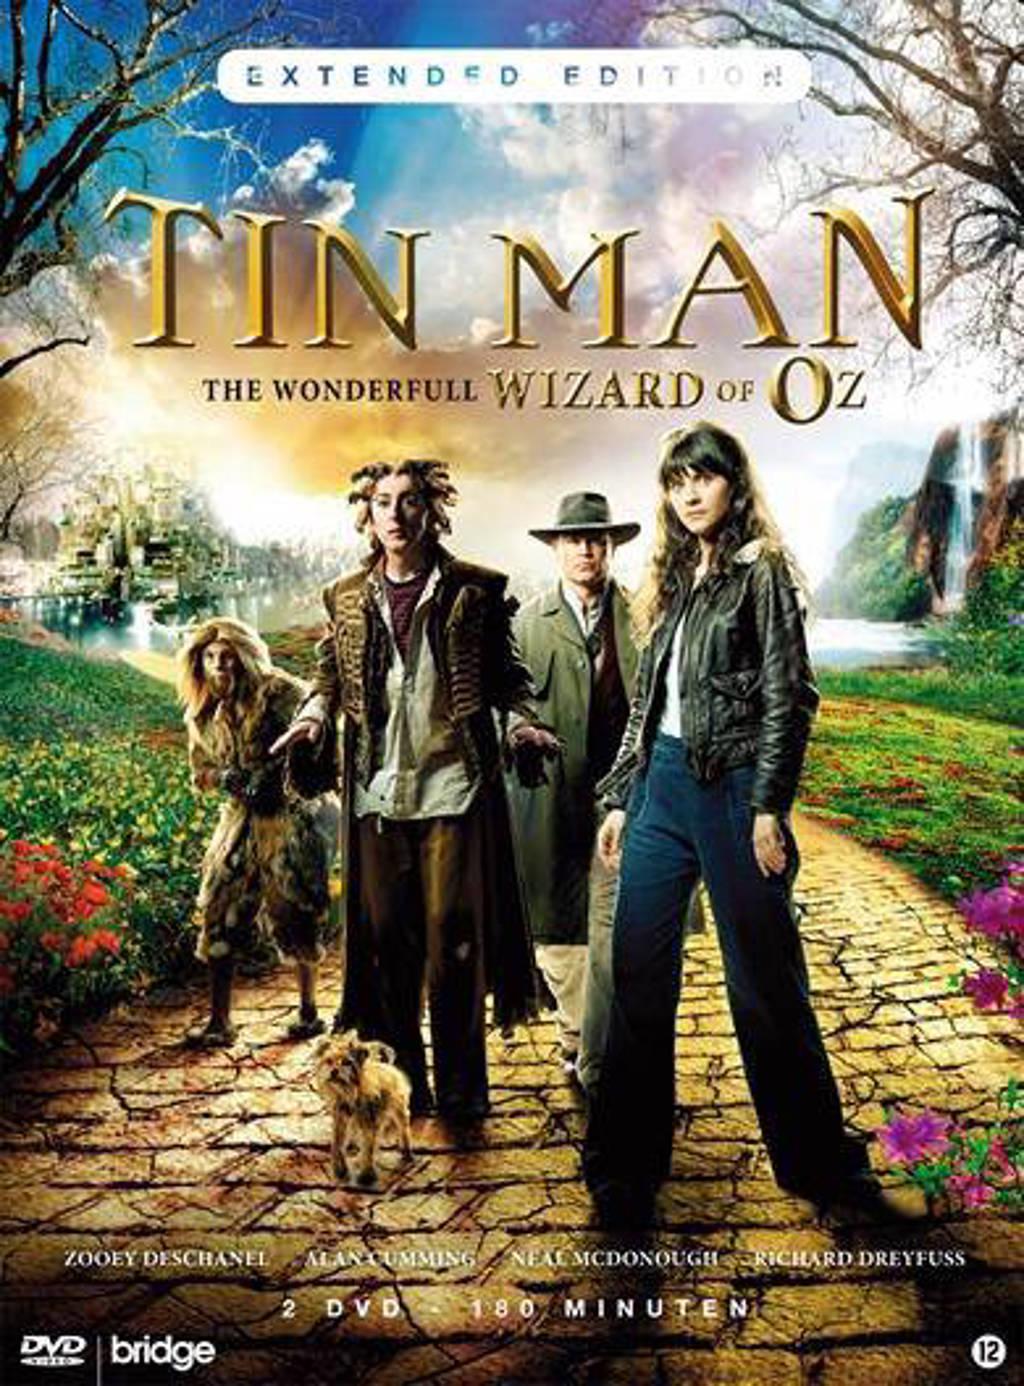 Tin man - The wonderfull wizard of Oz (DVD)